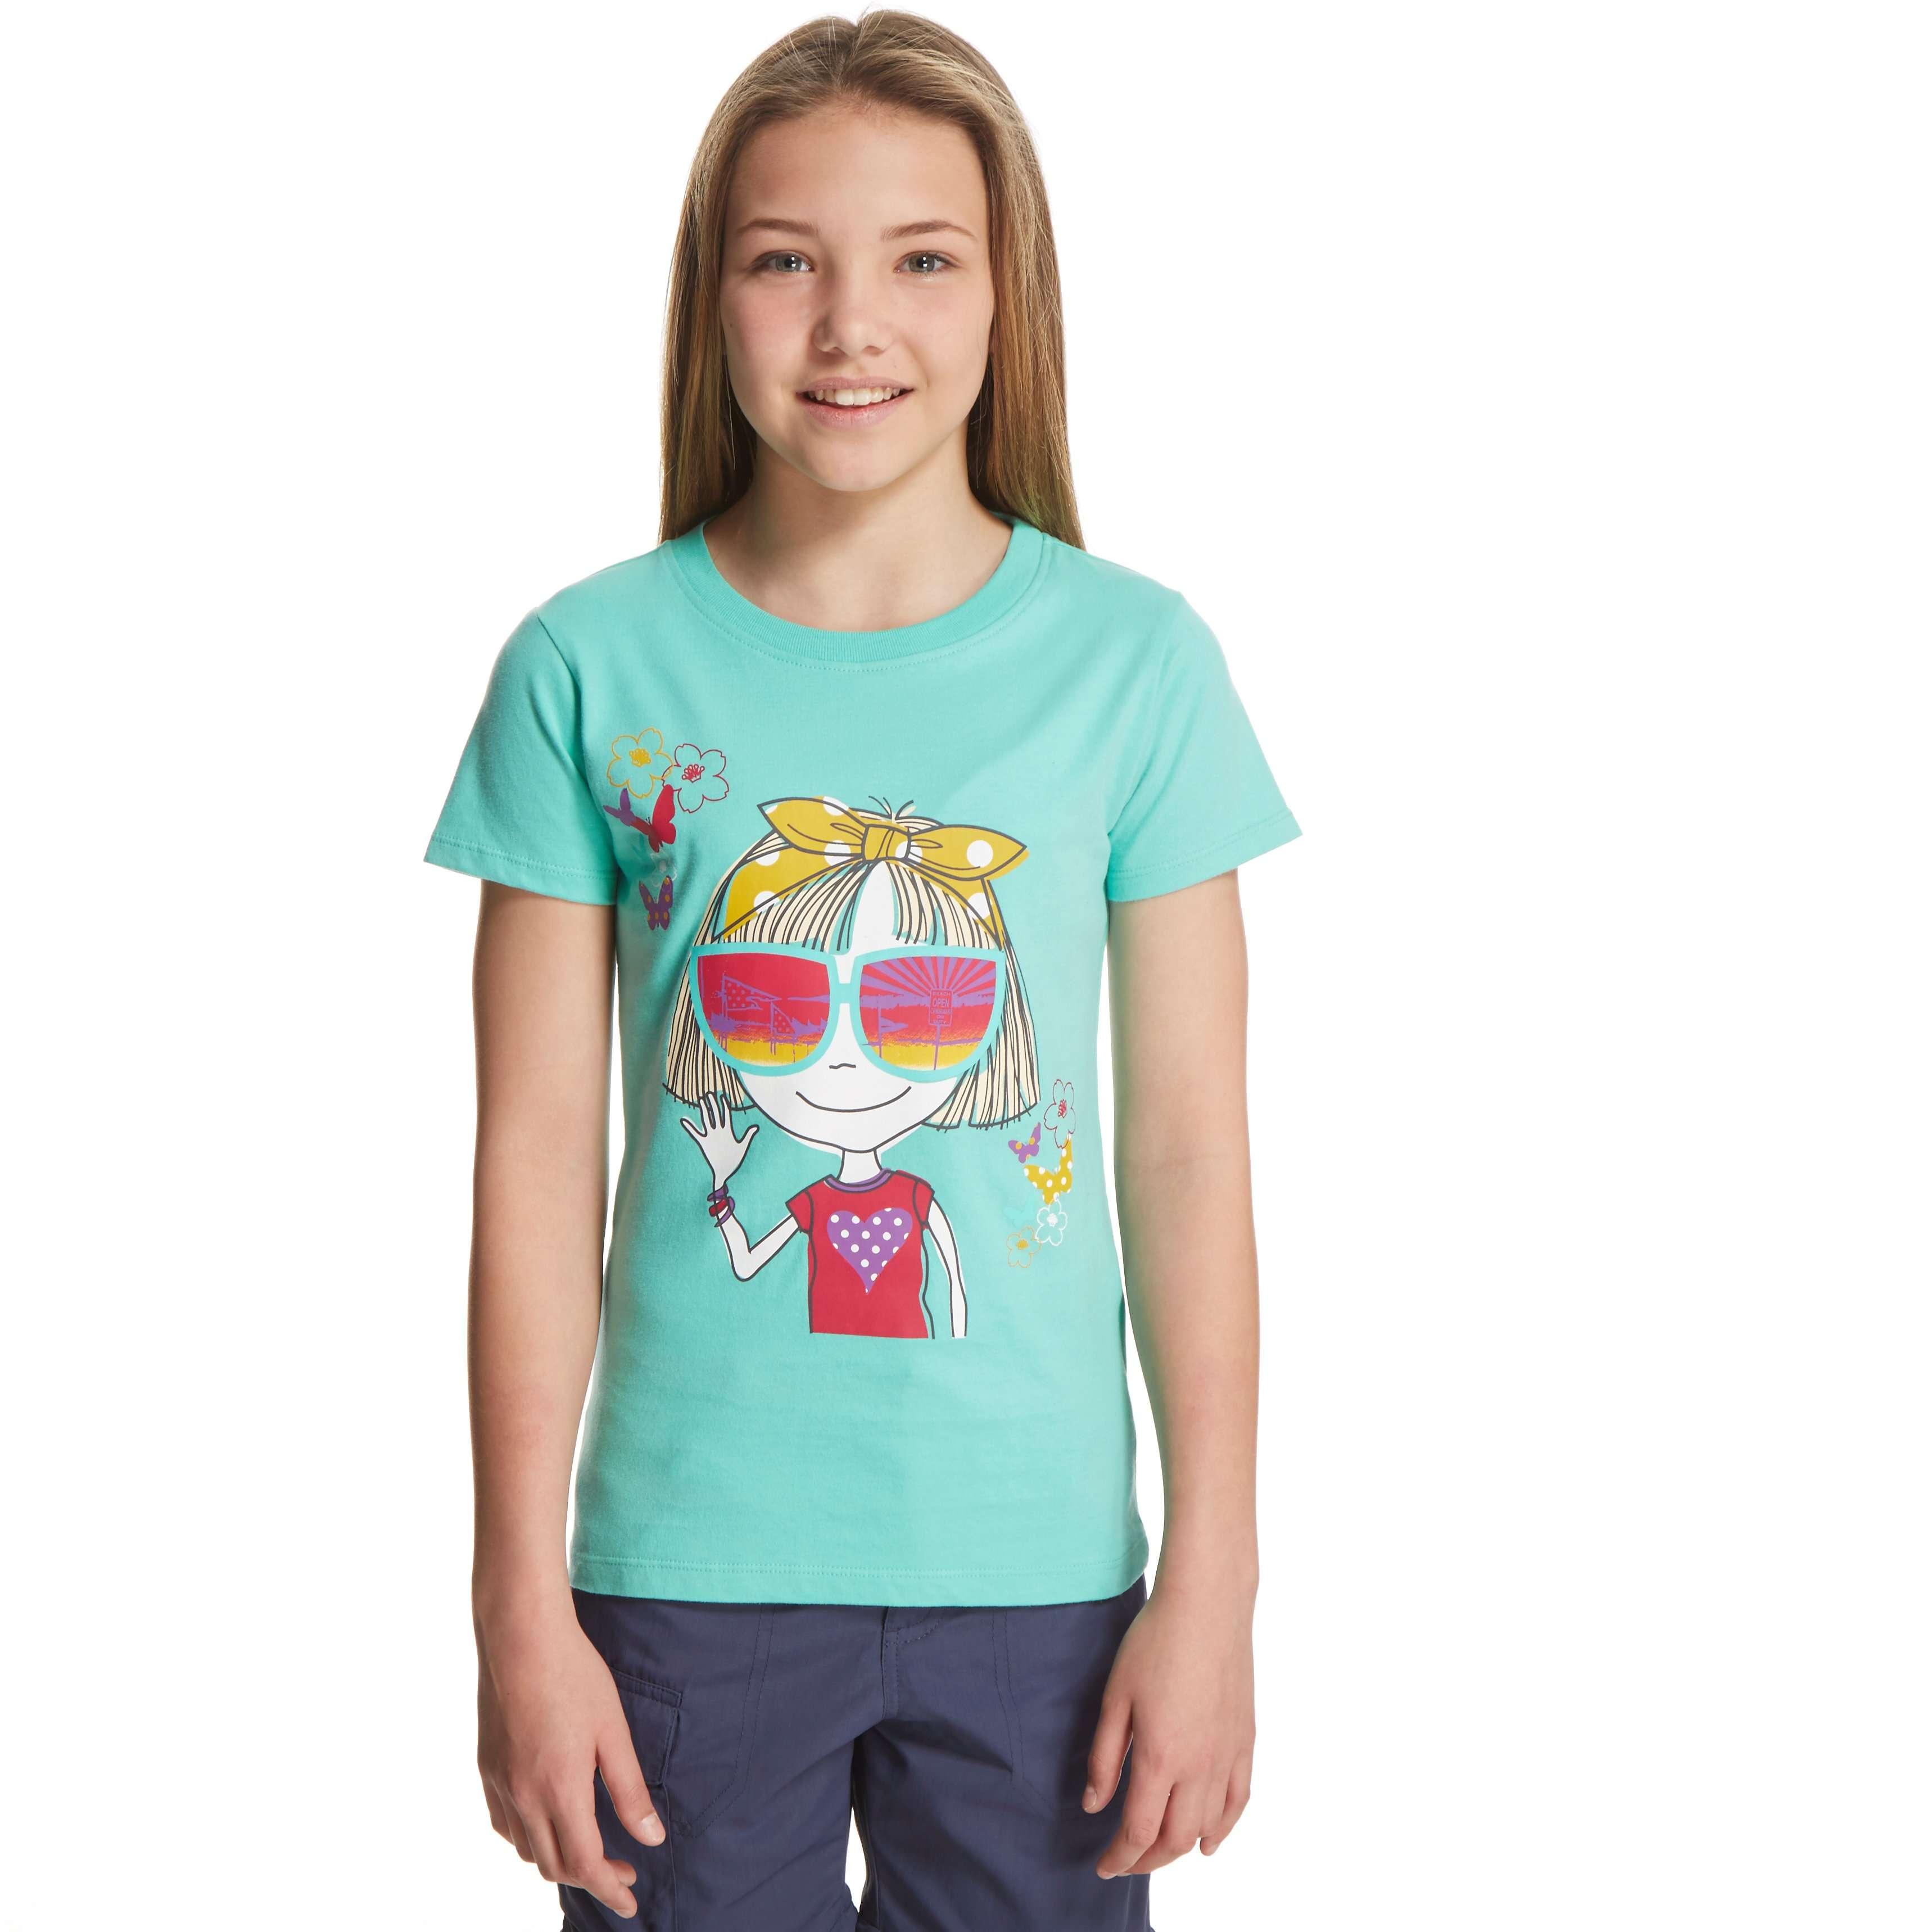 PETER STORM Girl's Character T-Shirt